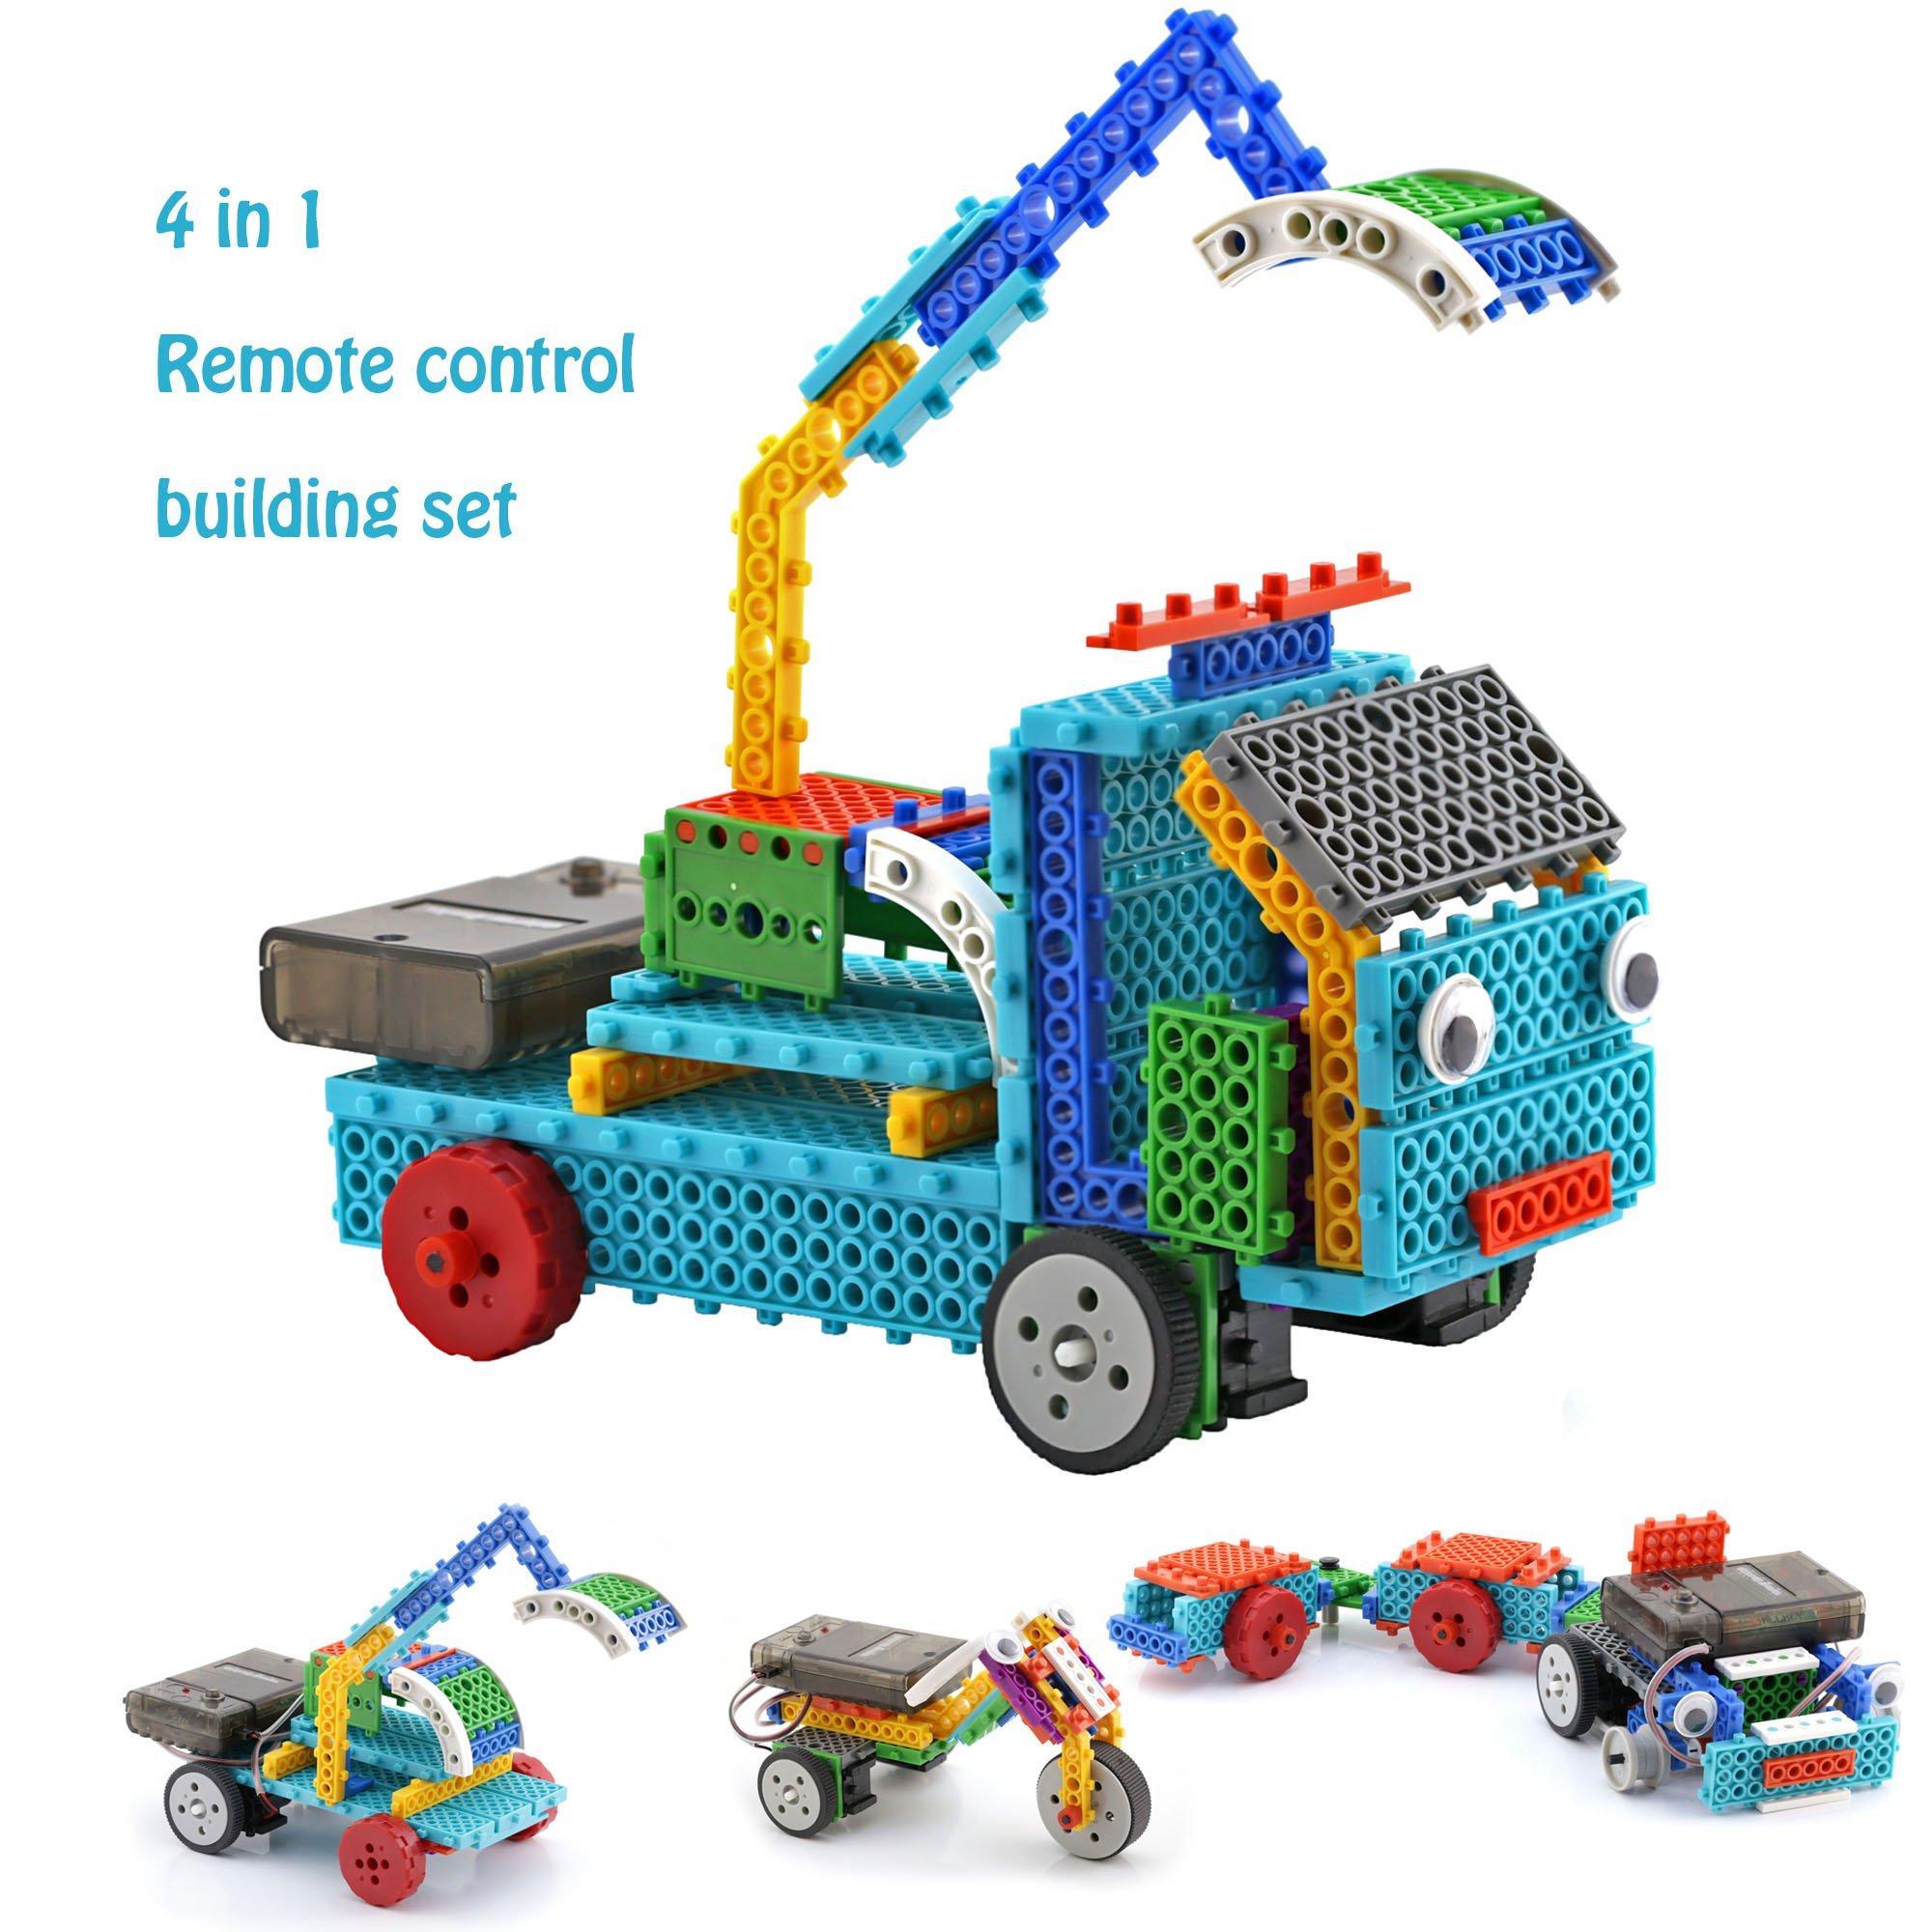 Building Toys For Teenage Boys : Rc robotics amazon